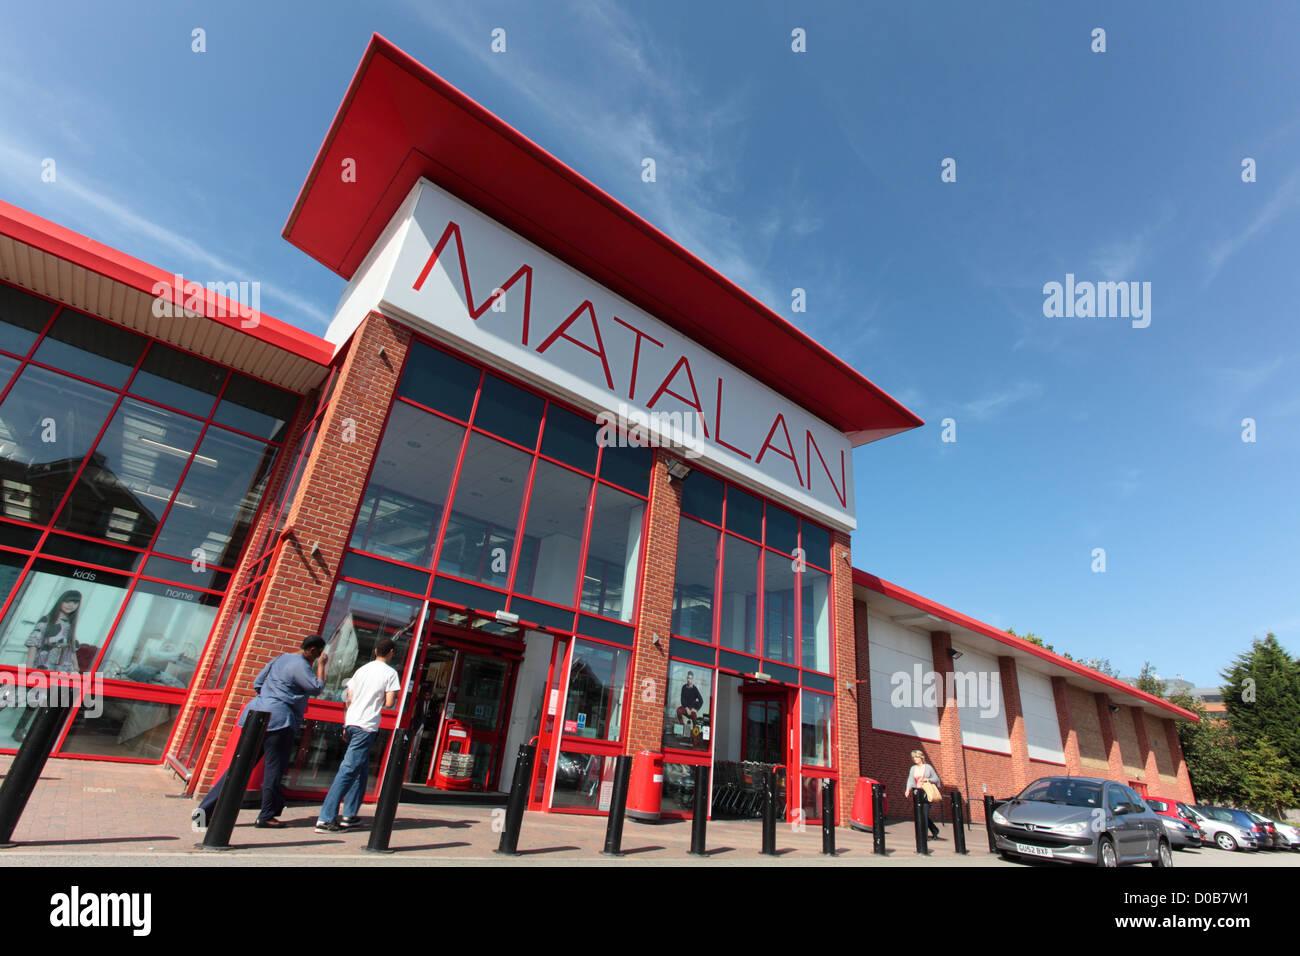 Matalan store Stock Photo